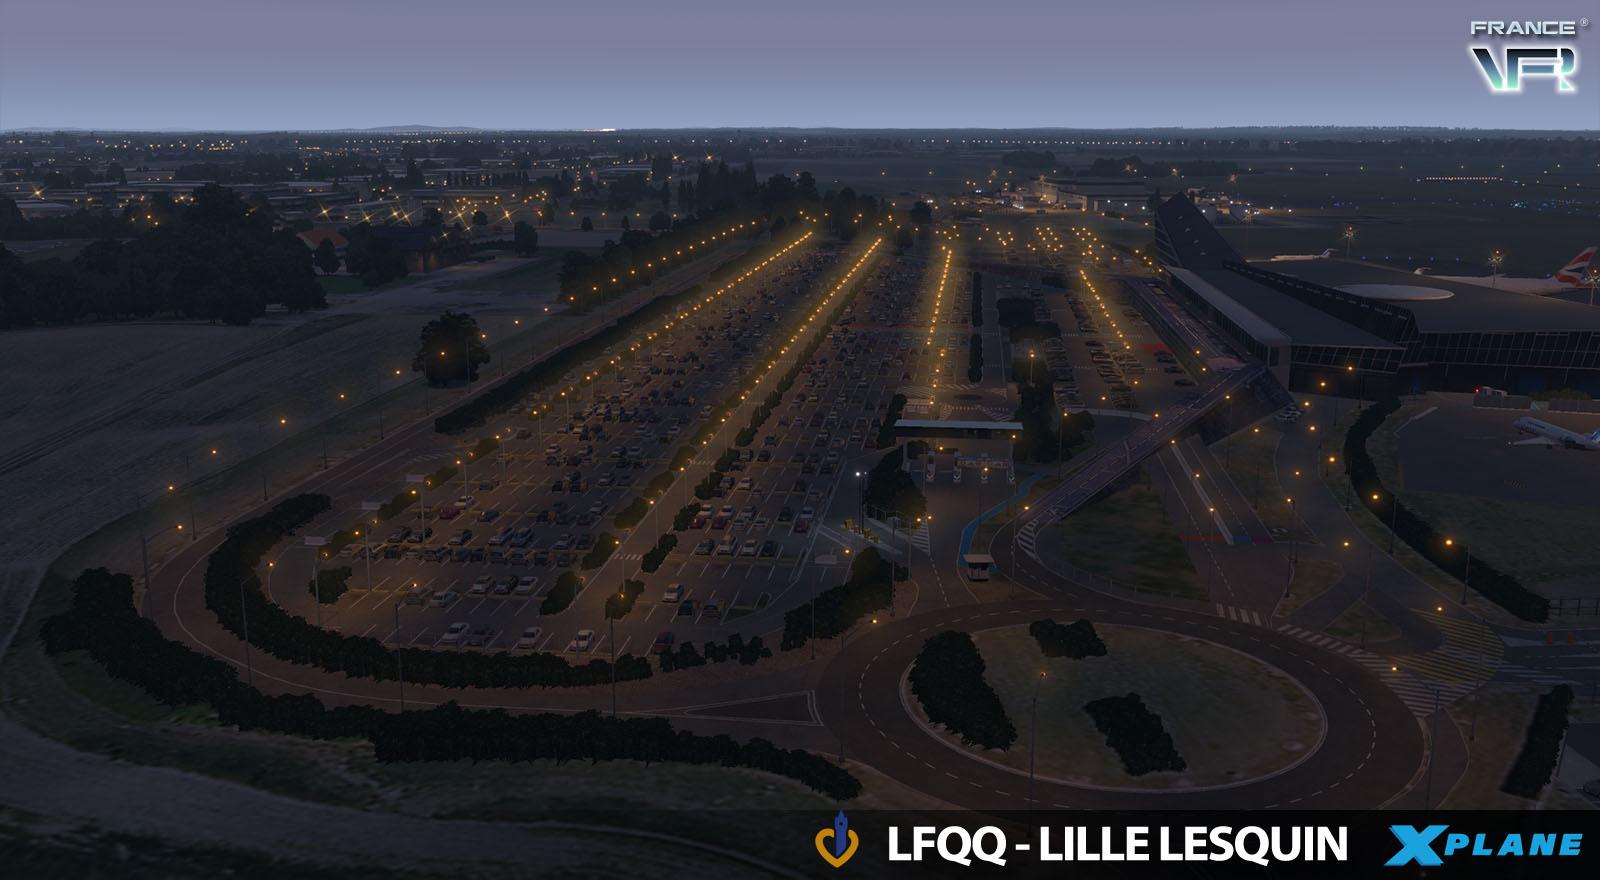 LFQQXP_42